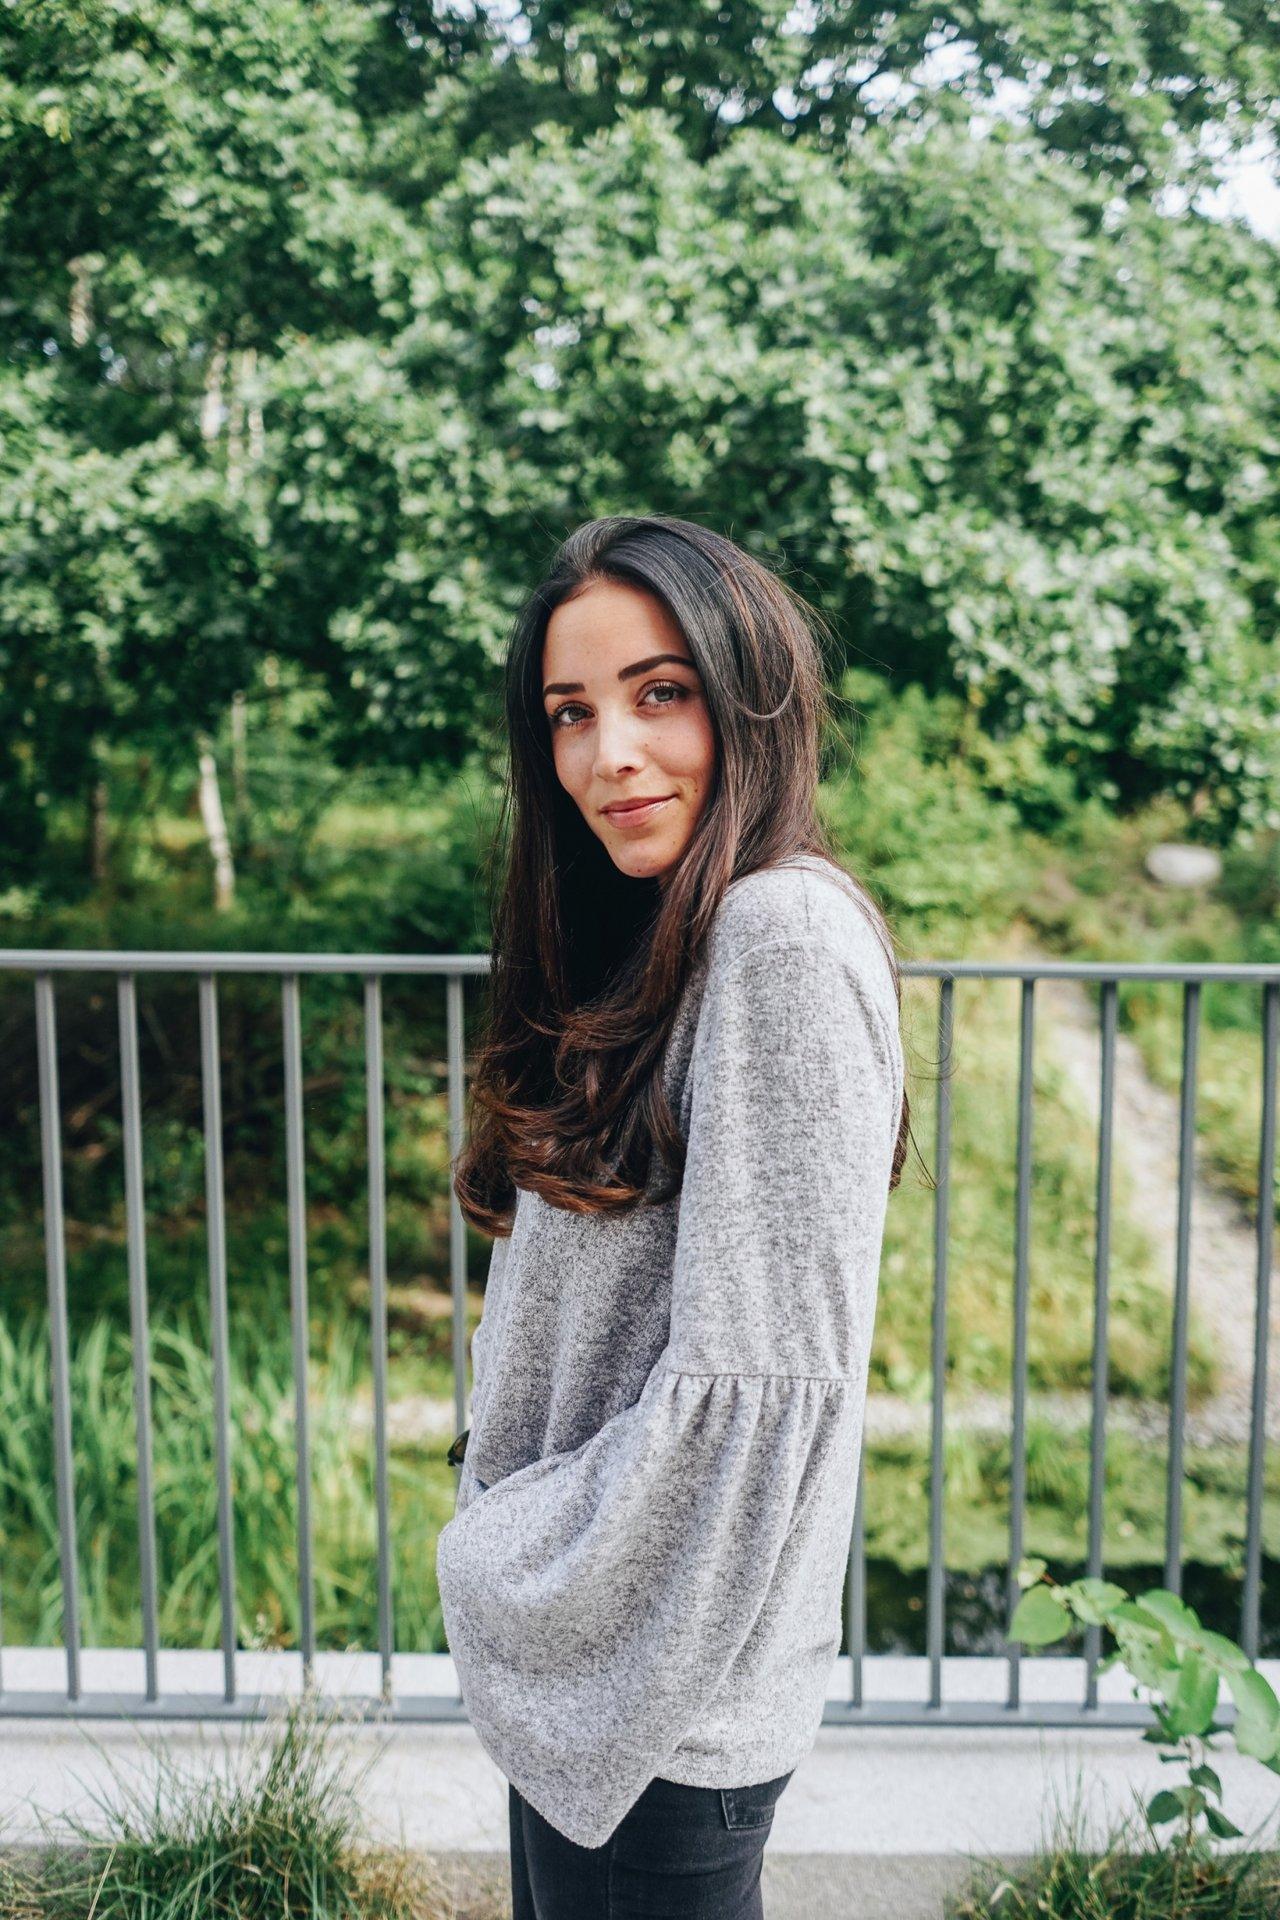 Michaela DeléR GREY SWEATHER (5 av 11)